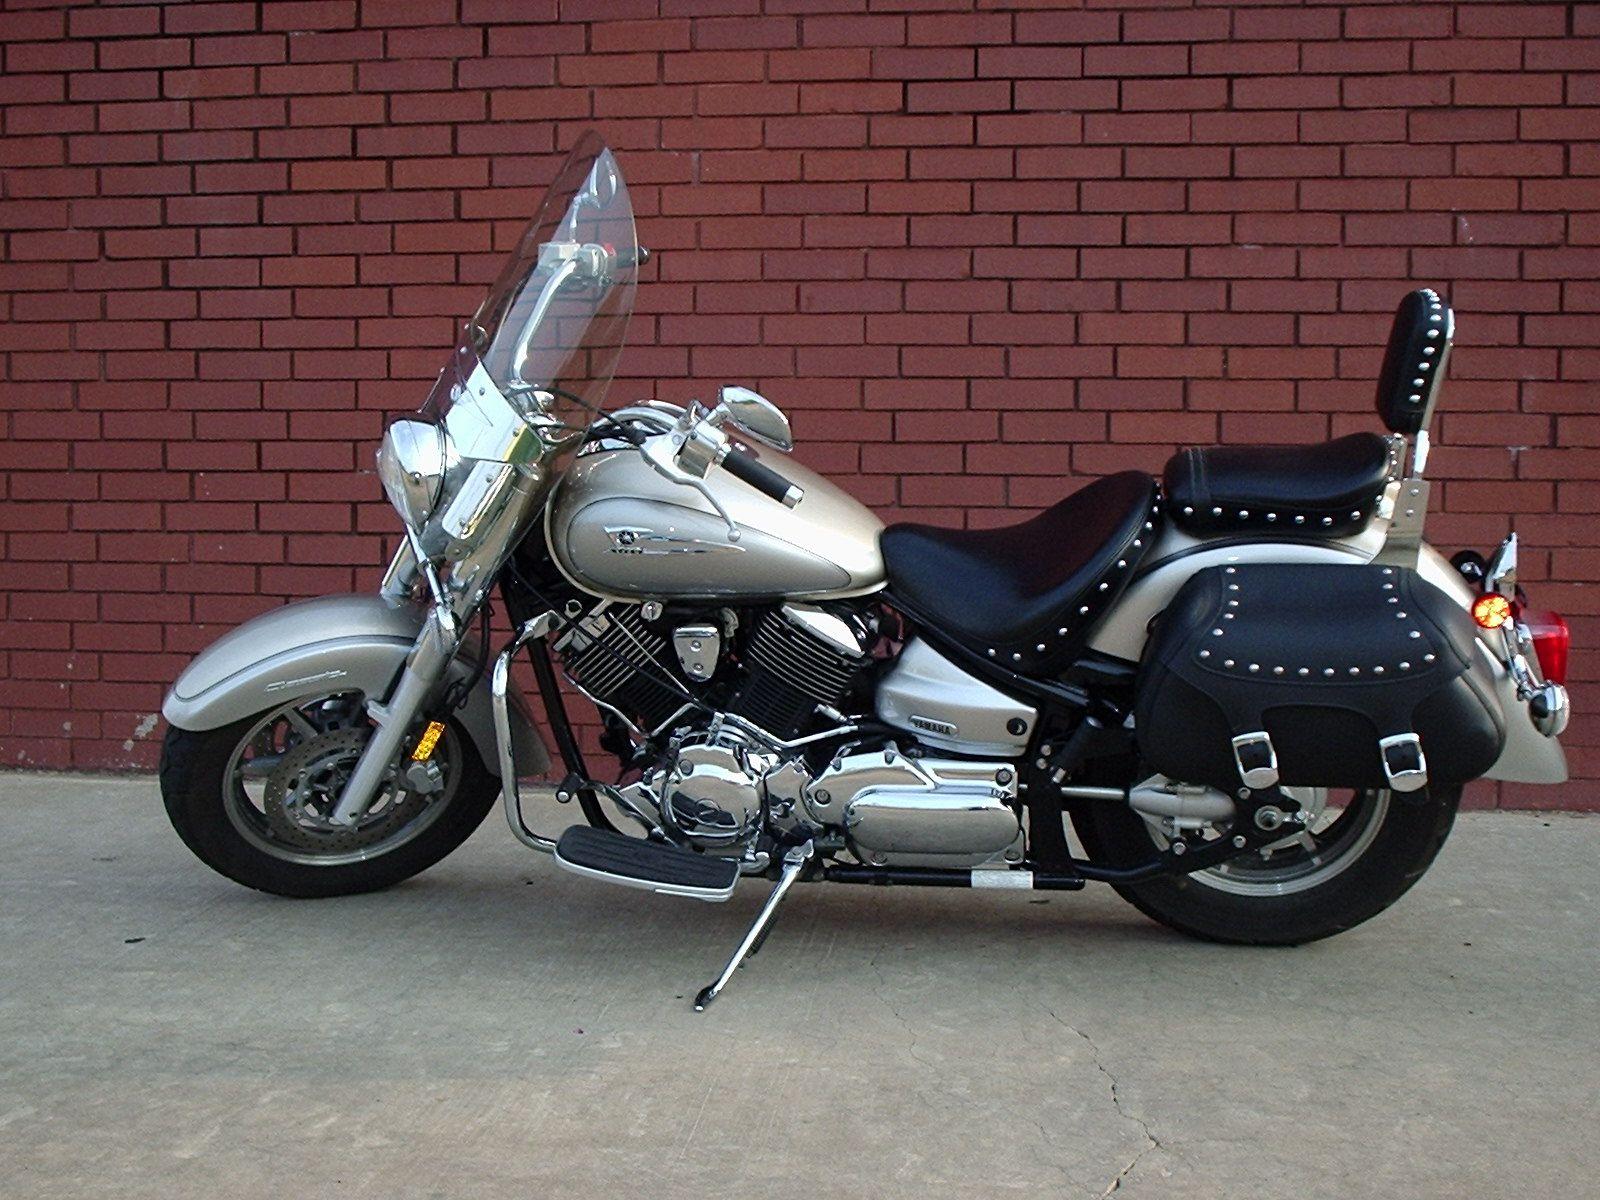 Yamaha 2006 v-star 1100 silverado